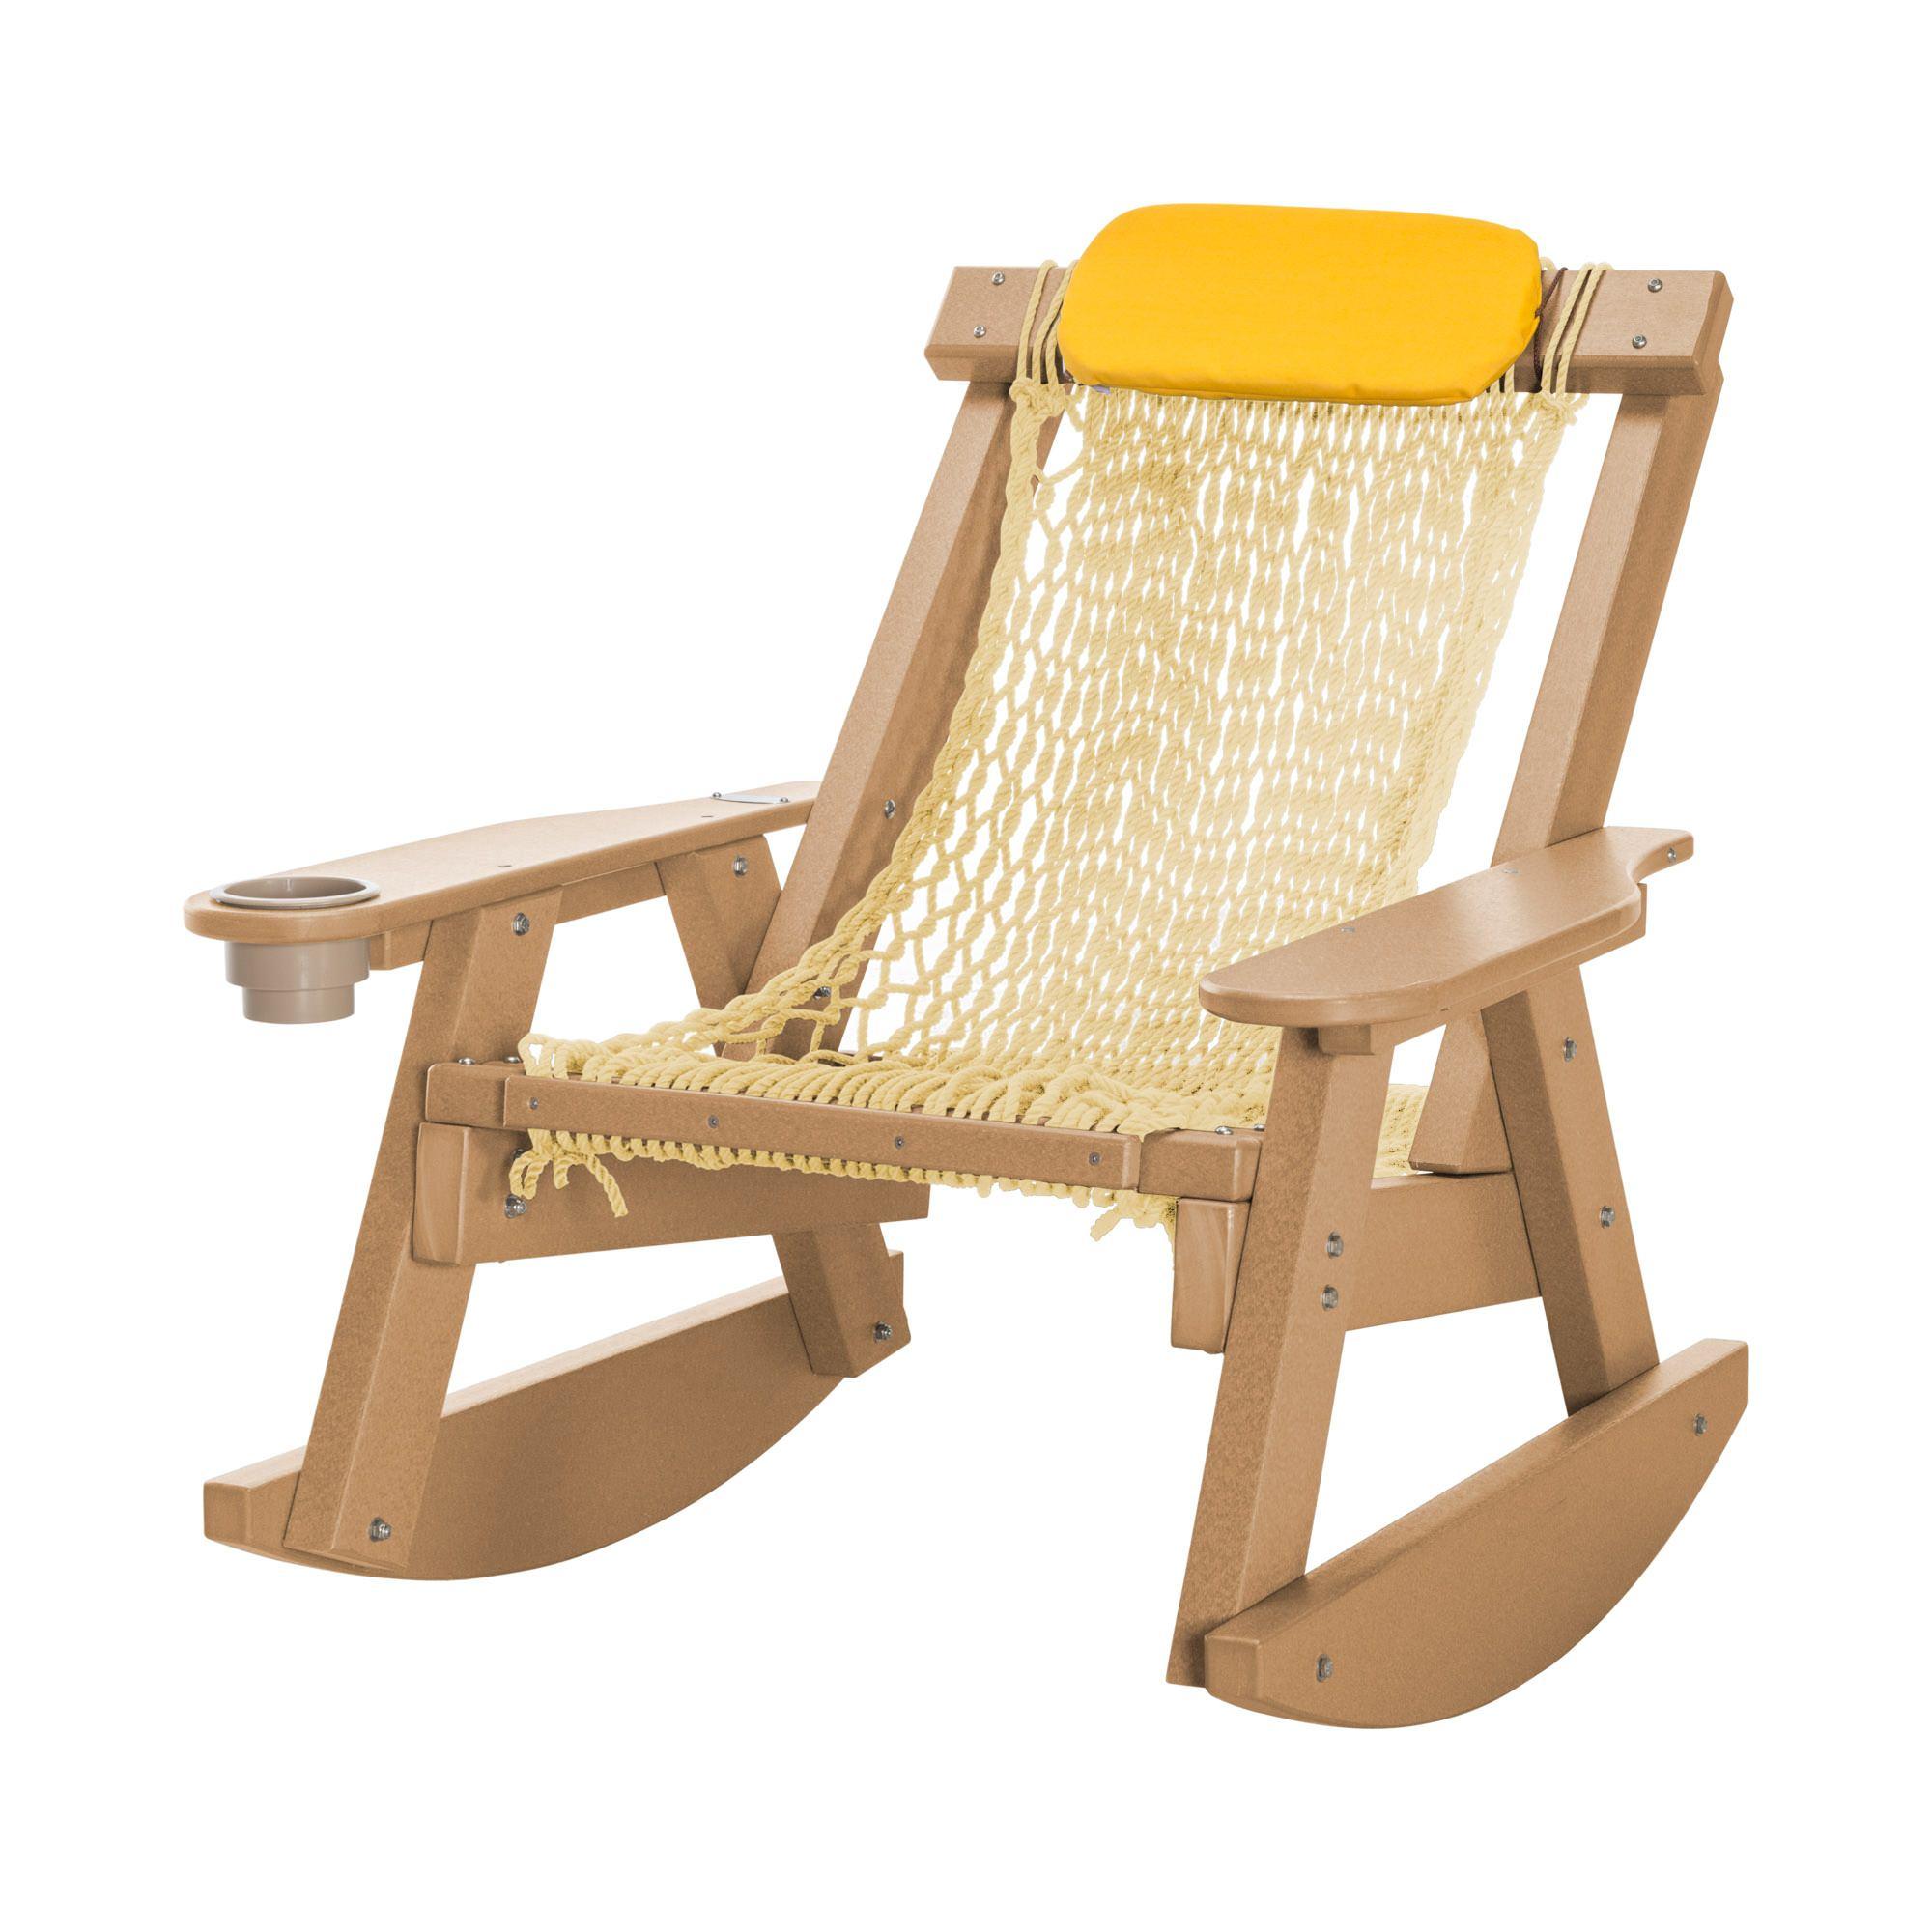 ... Chair/Rocker Replacement Hardware ...